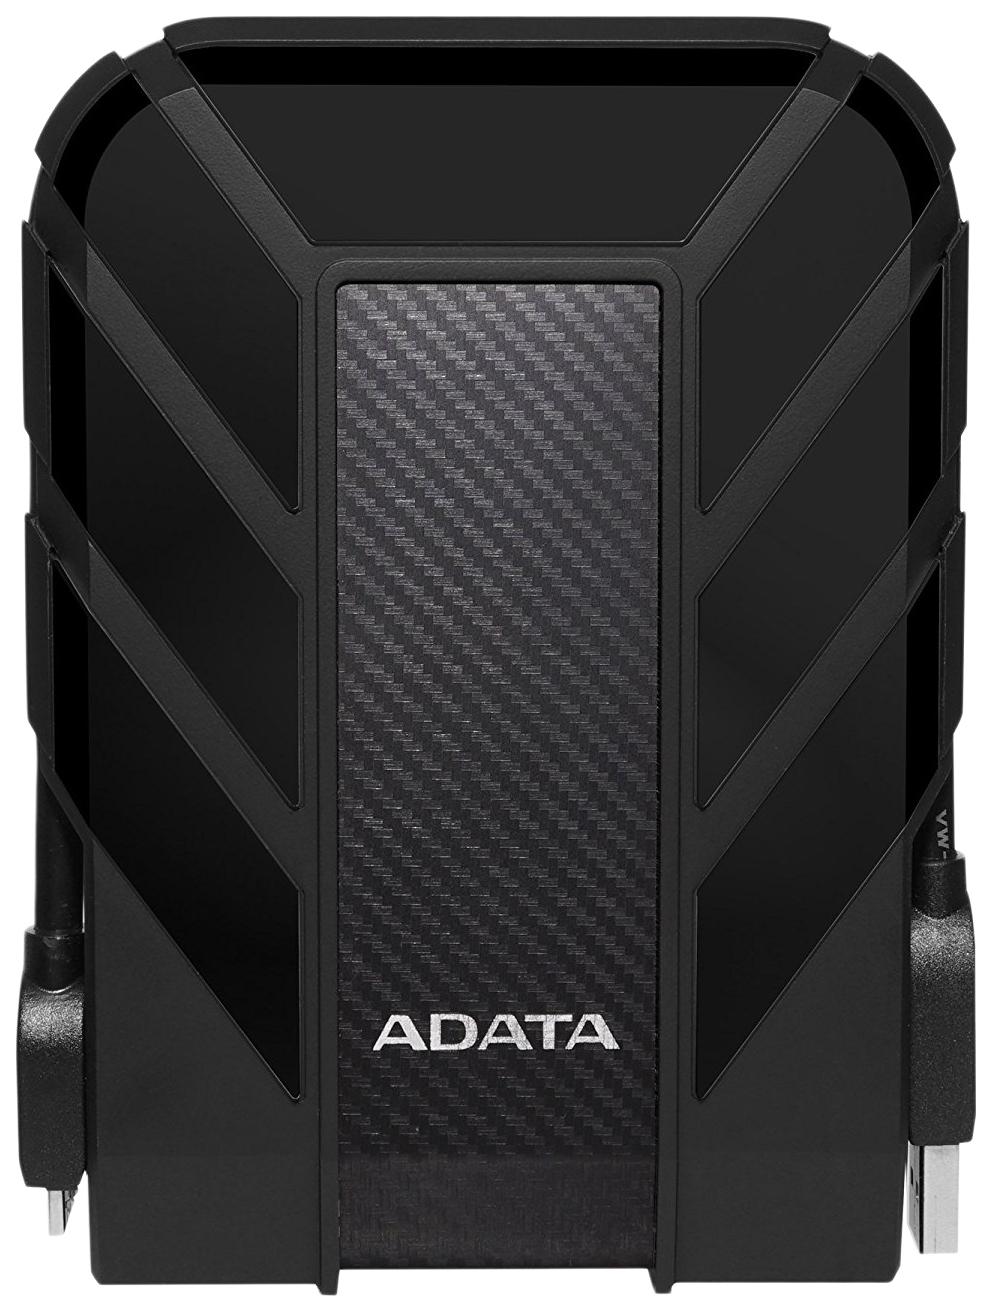 Внешний диск HDD ADATA 1TB Black (AHD710P